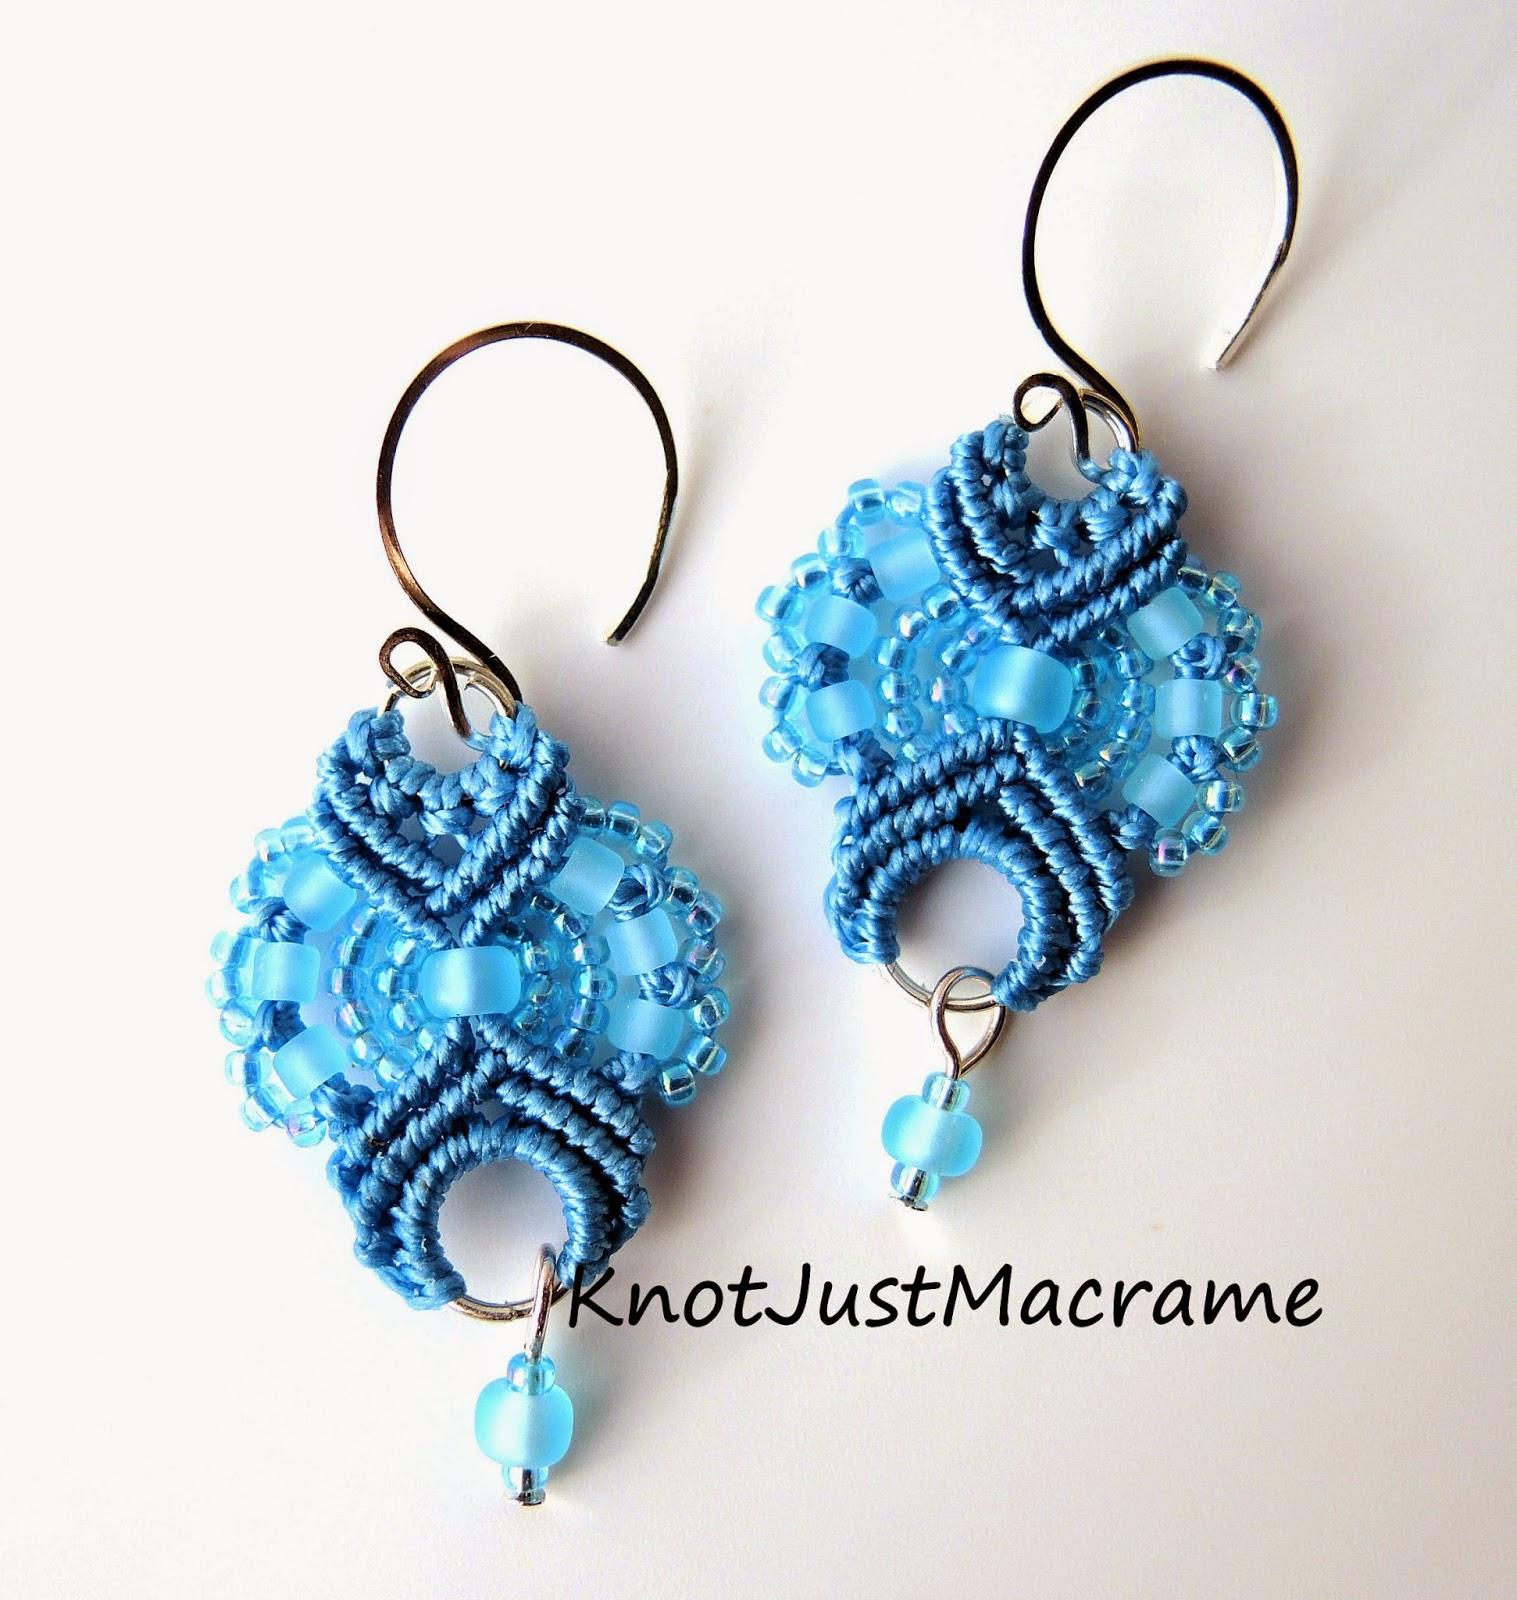 Micro macrame earrings in blue by Sherri Stokey of Knot Just Macrame.